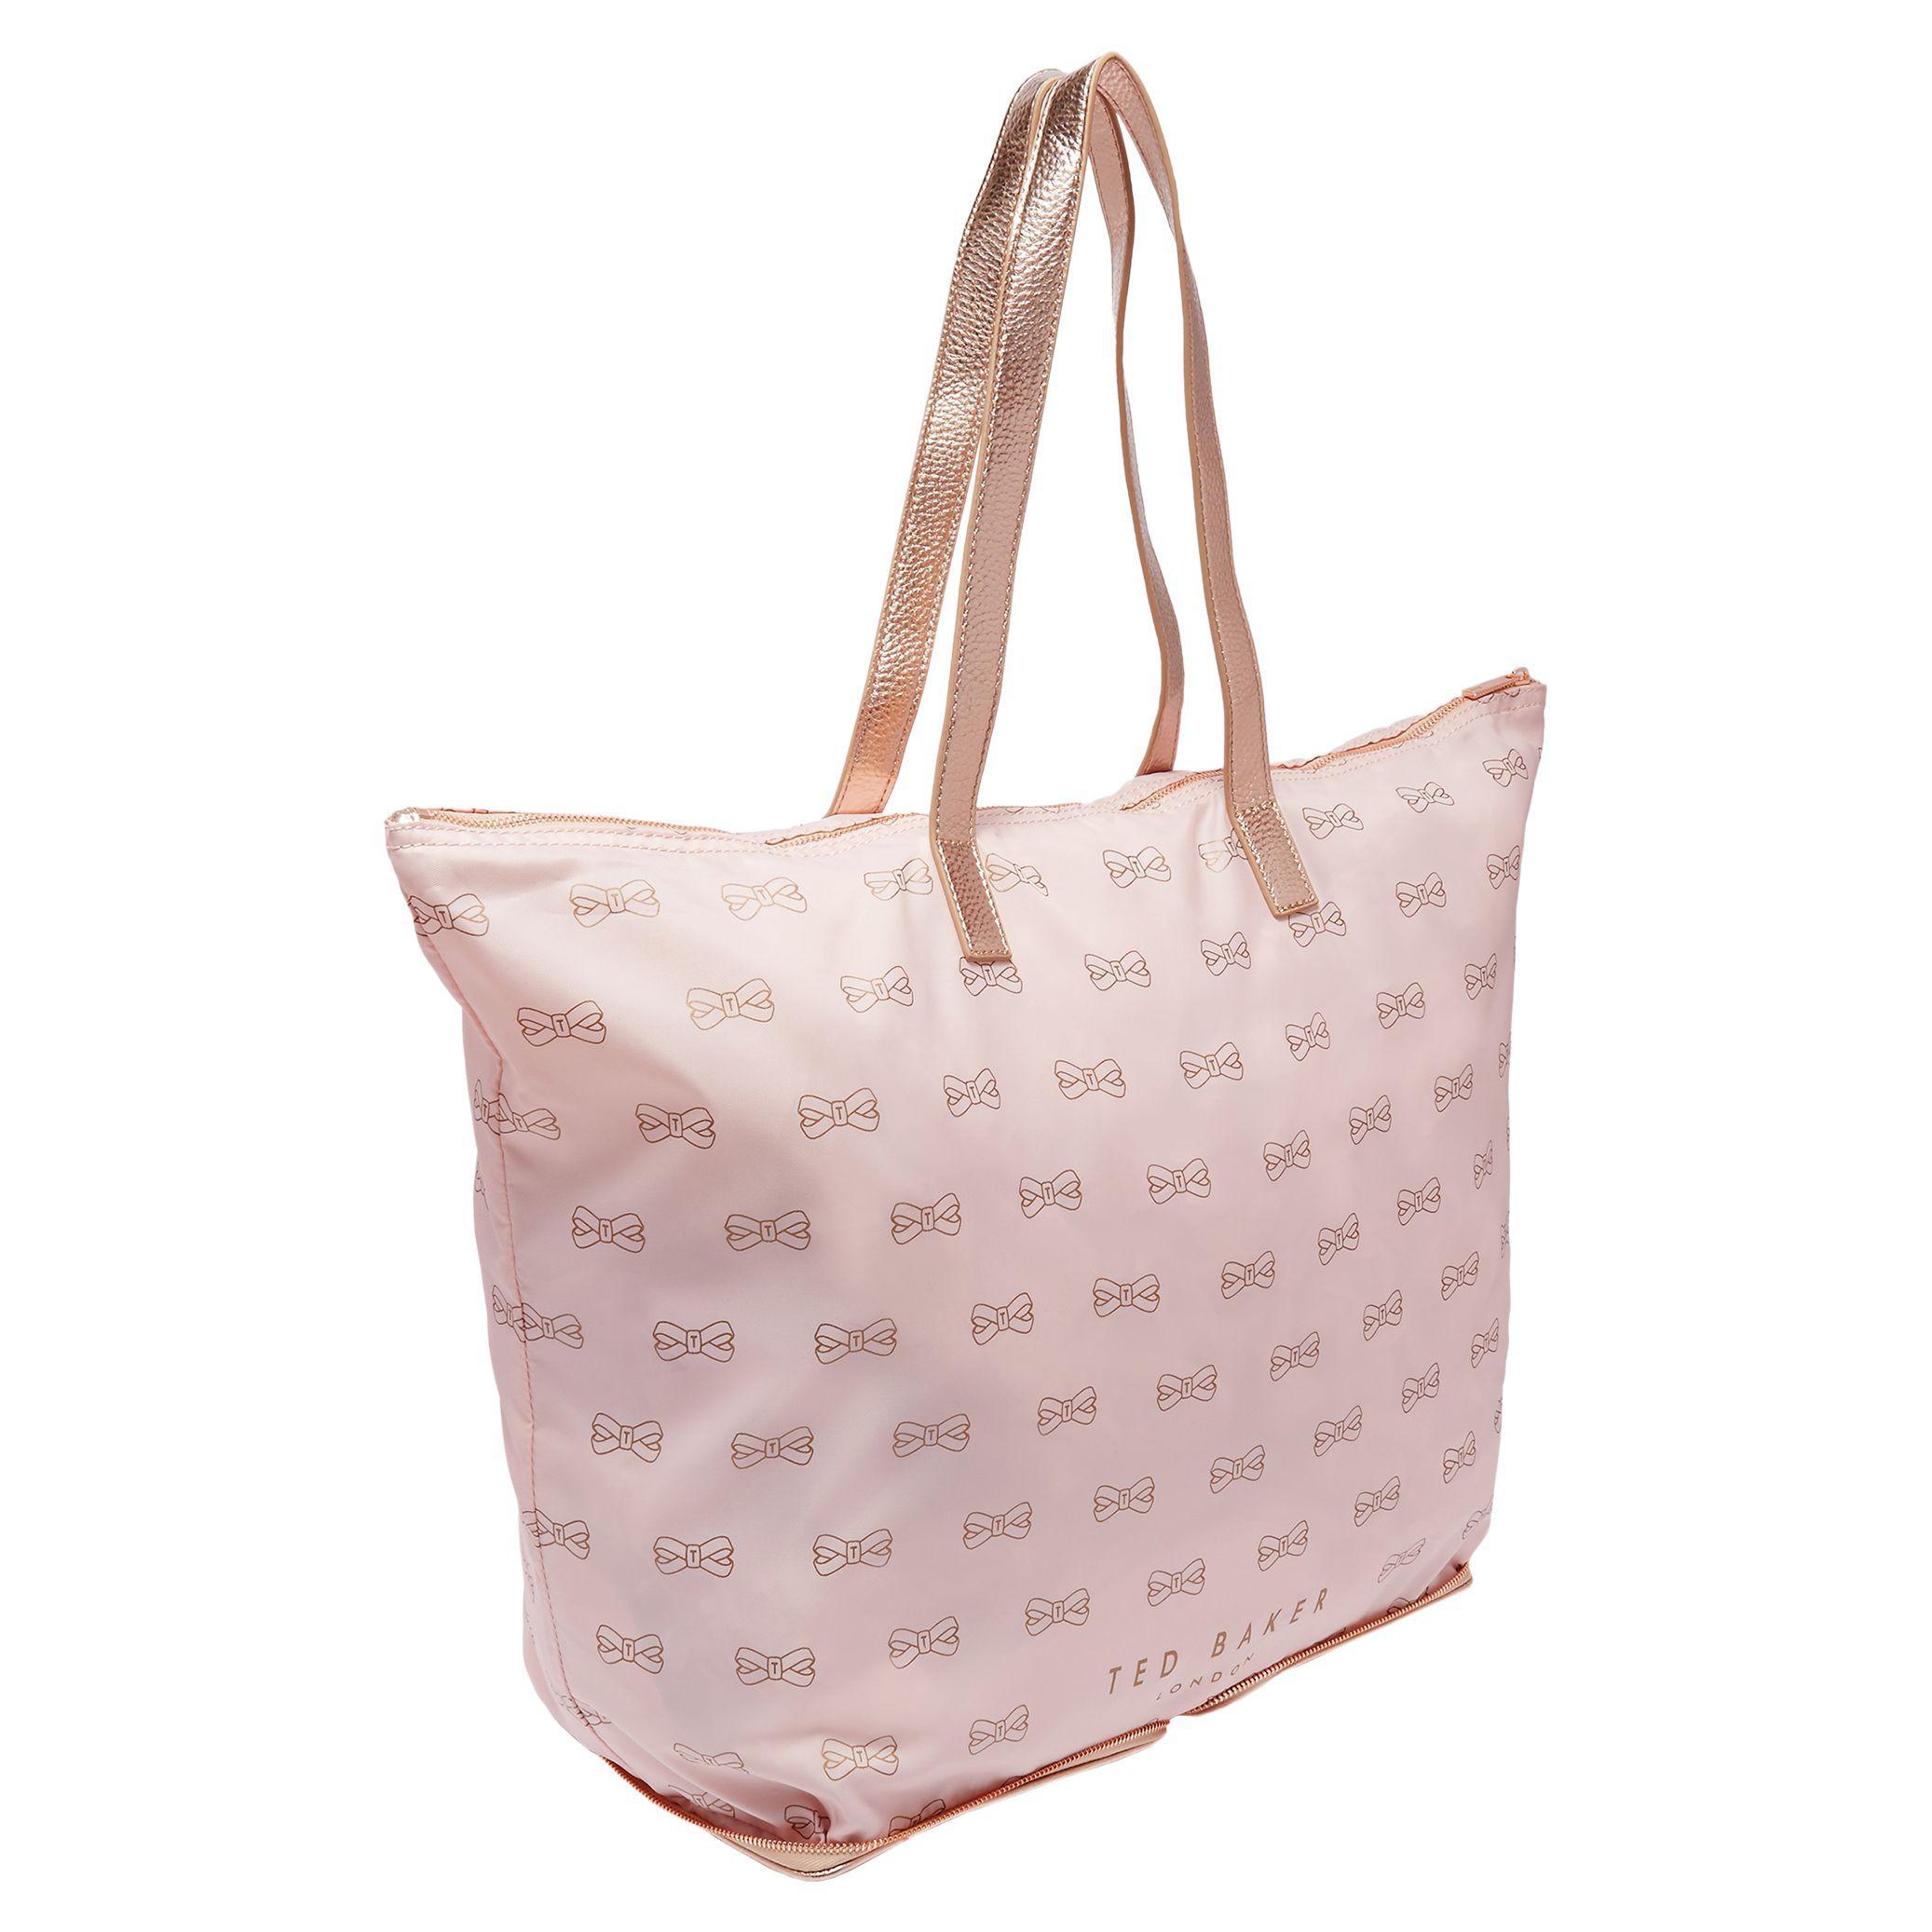 d3ddd5f9b3ff26 Ted Baker Jeb Foldaway Shopper Bag in Pink - Lyst